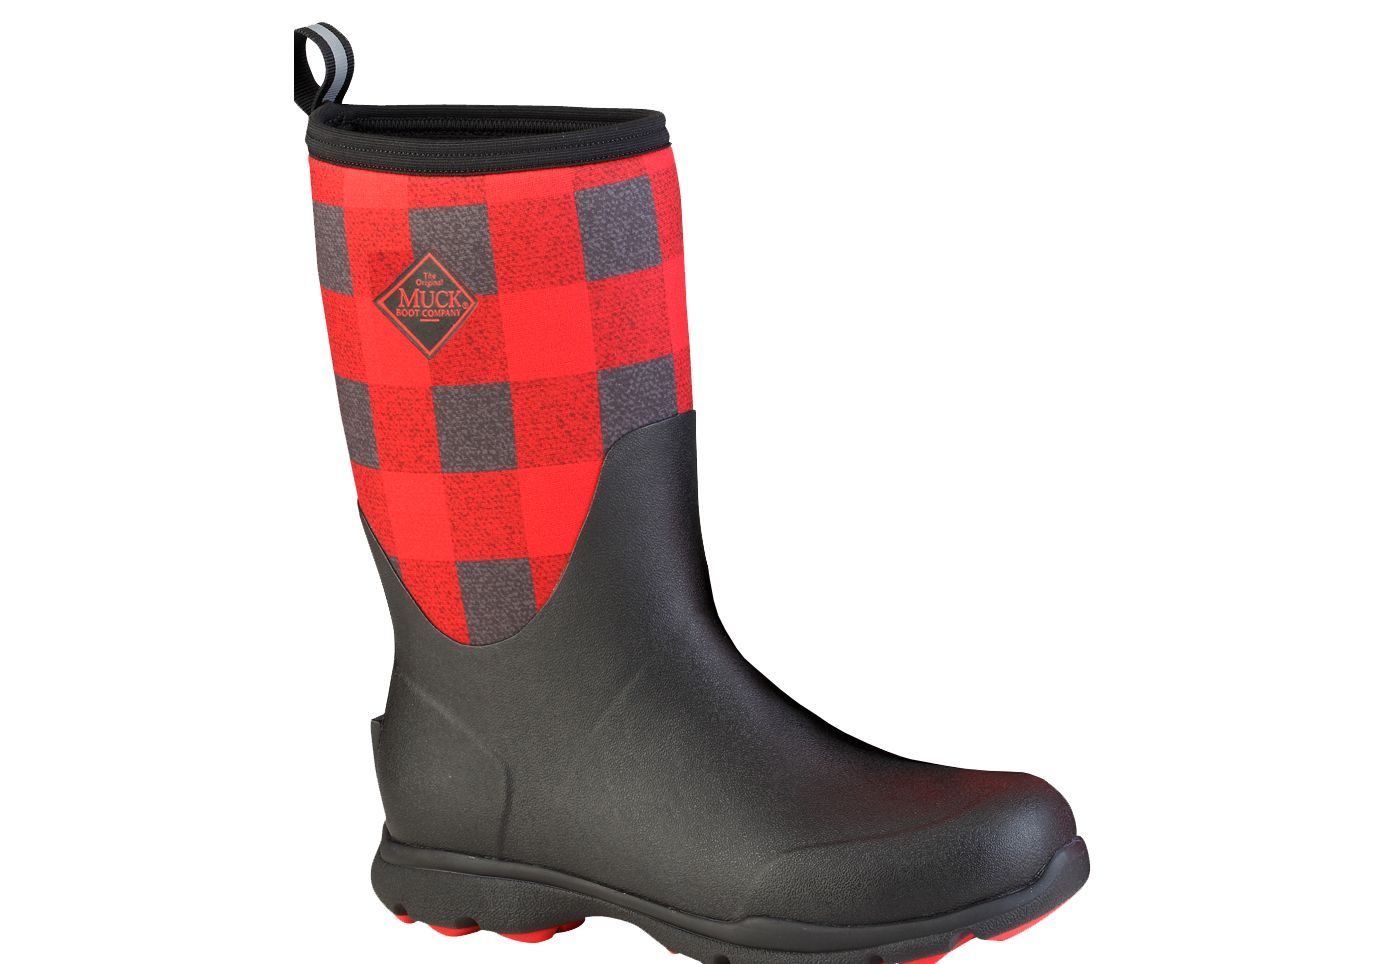 Muck Boots Men's Arctic Excursion Mid Waterproof Winter Boots